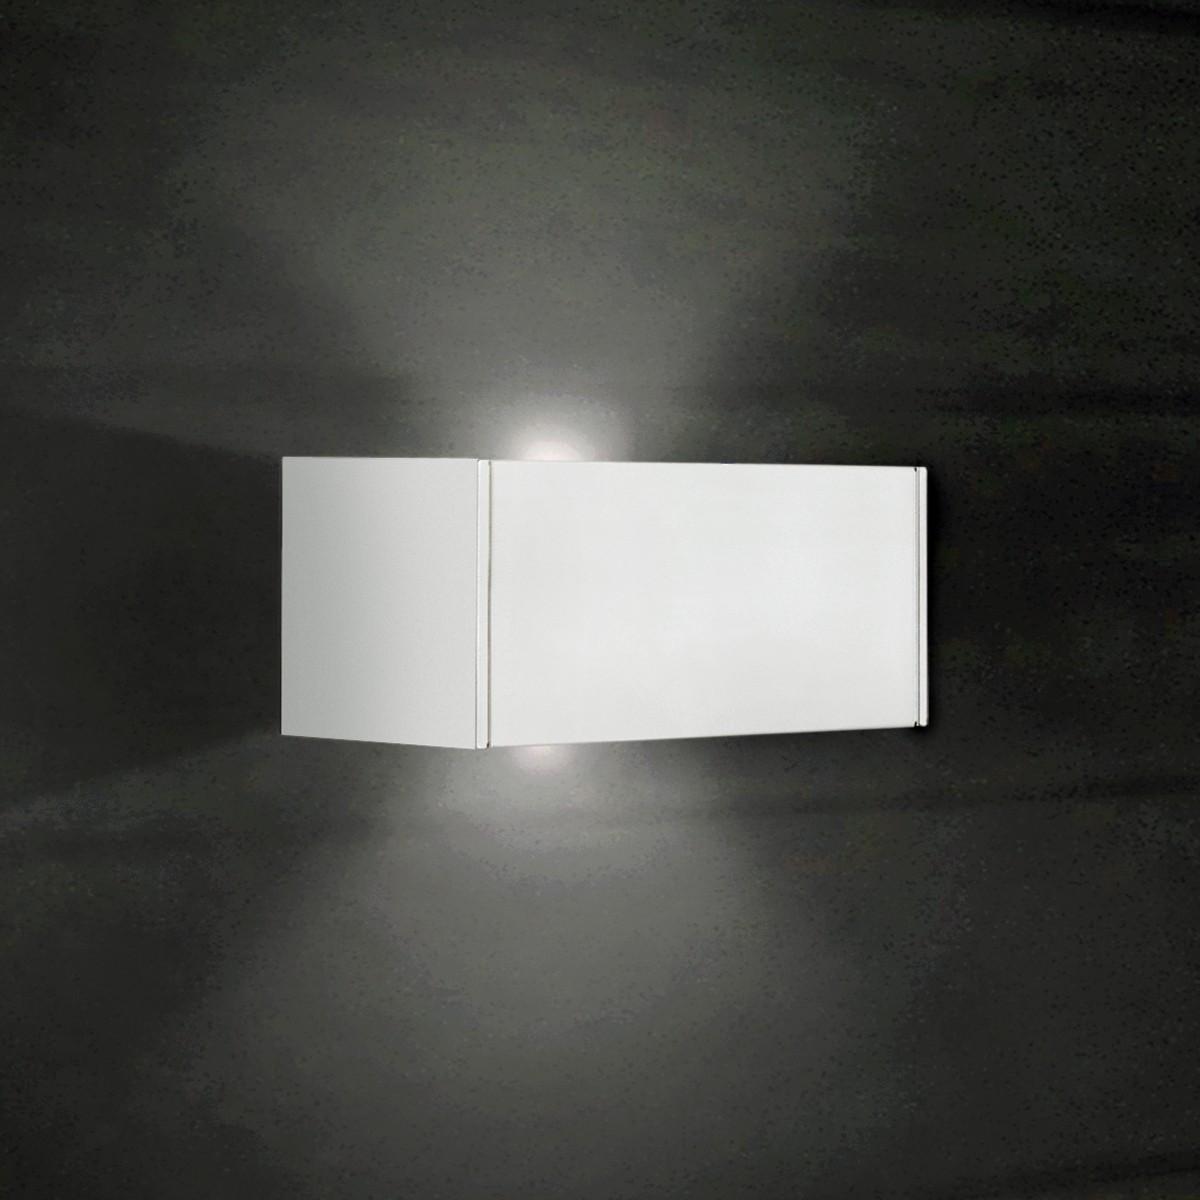 Milan T-LED Wandleuchte, 2-flg., weiß lackiert